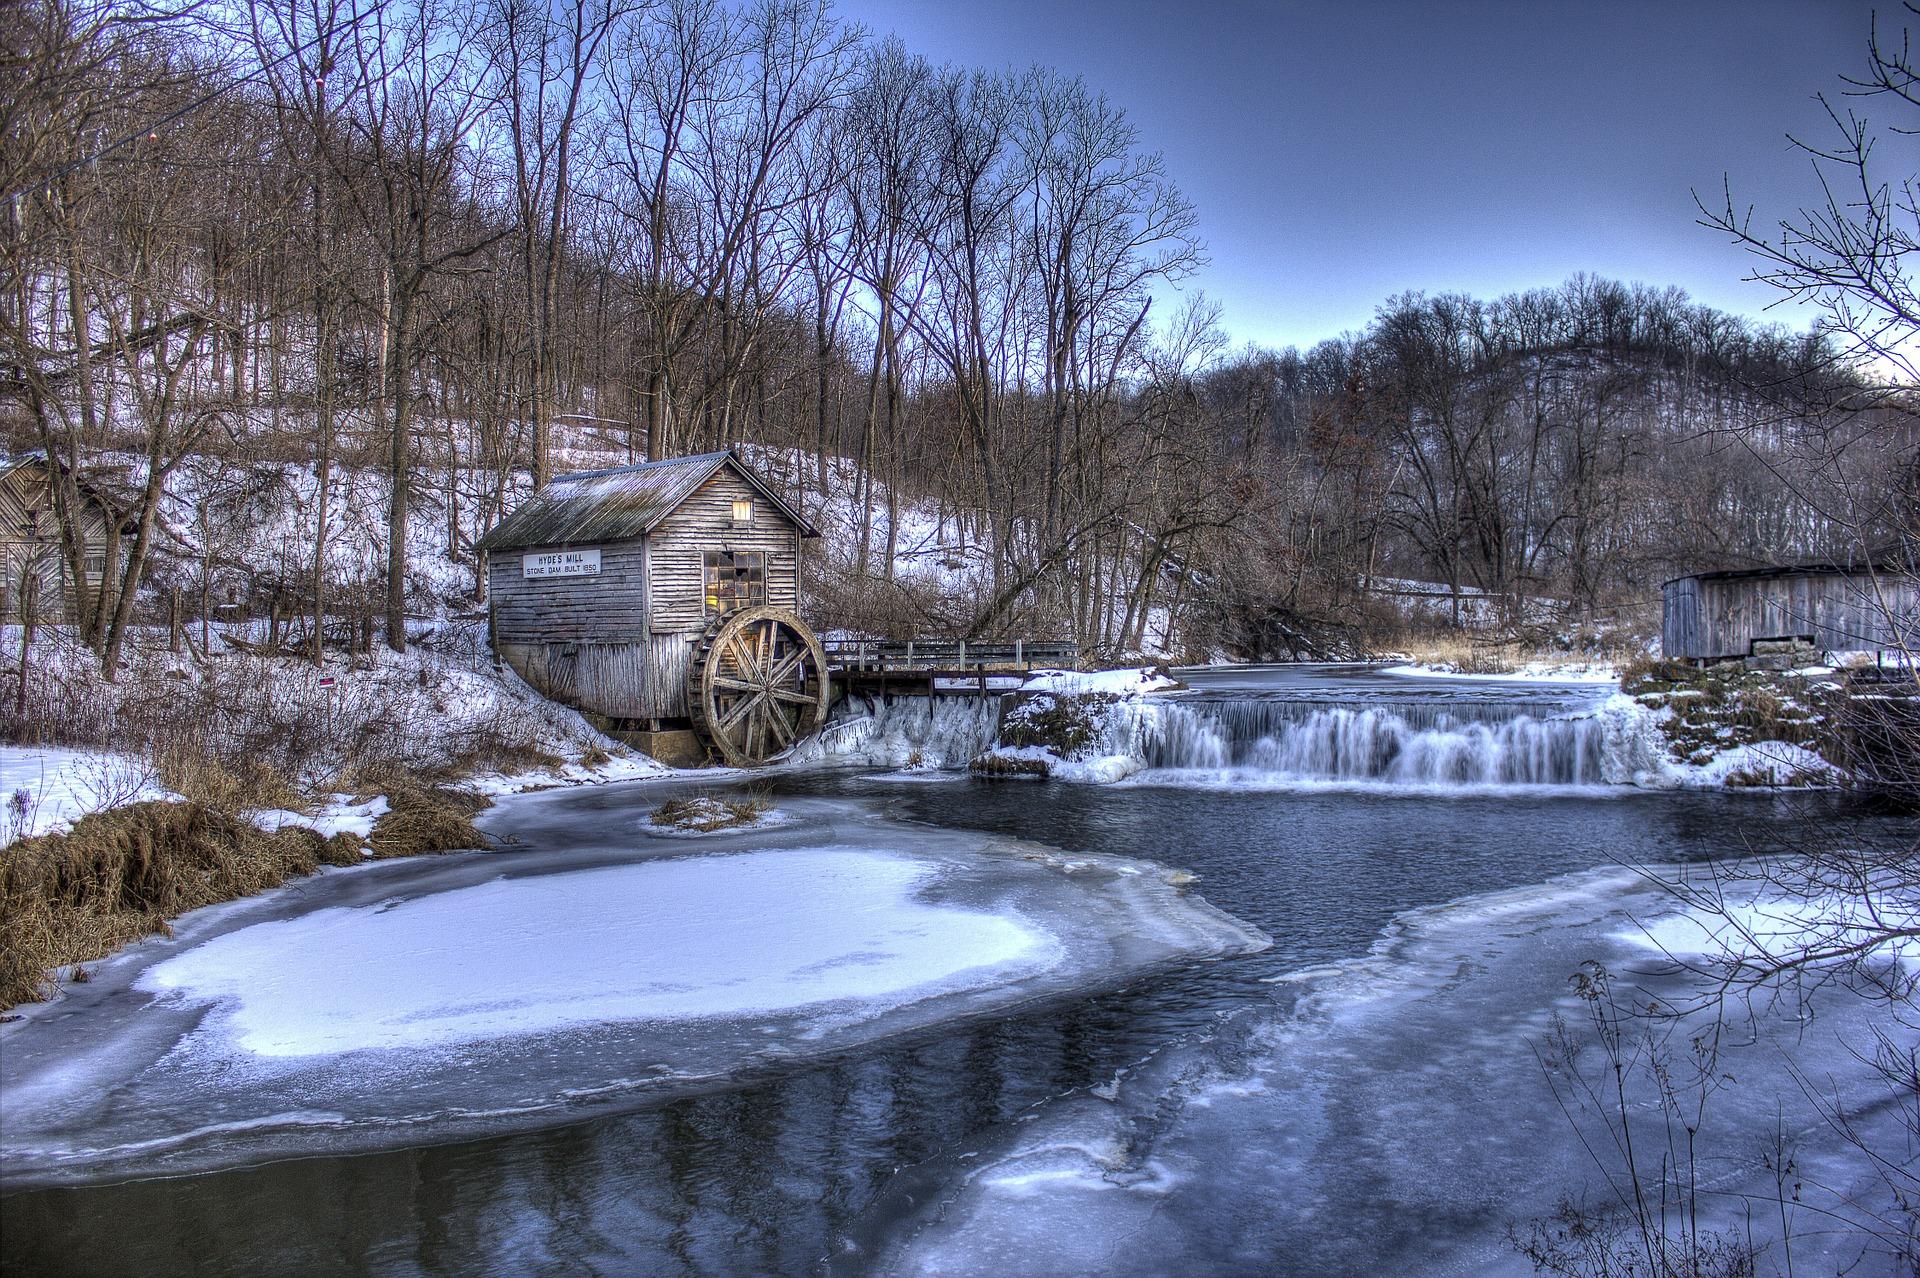 winter-1166962_1920.jpg